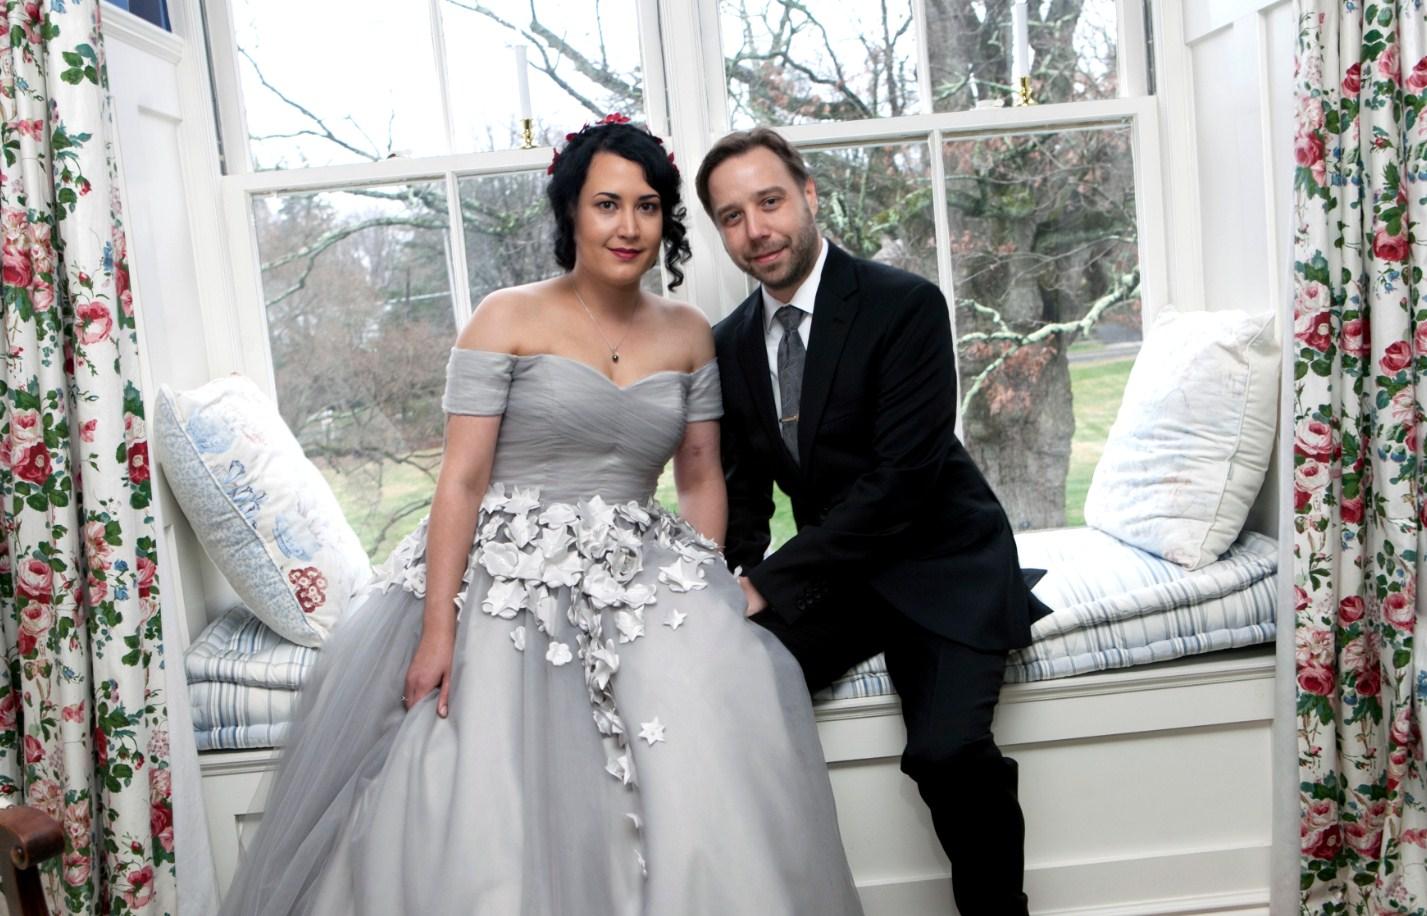 Before wedding photography